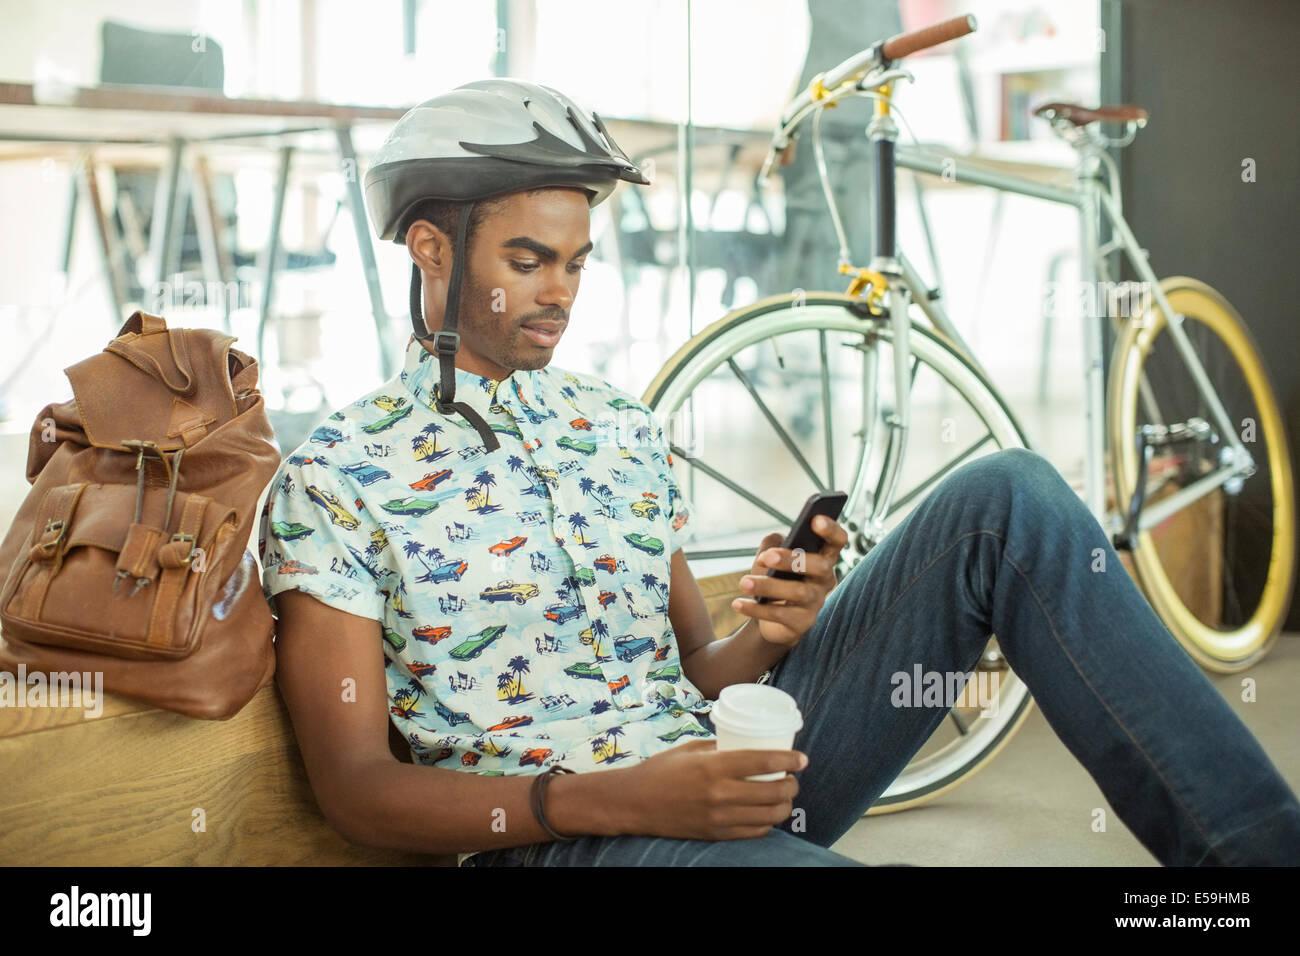 Mann in Fahrradhelm mit Handy im Büro Stockbild